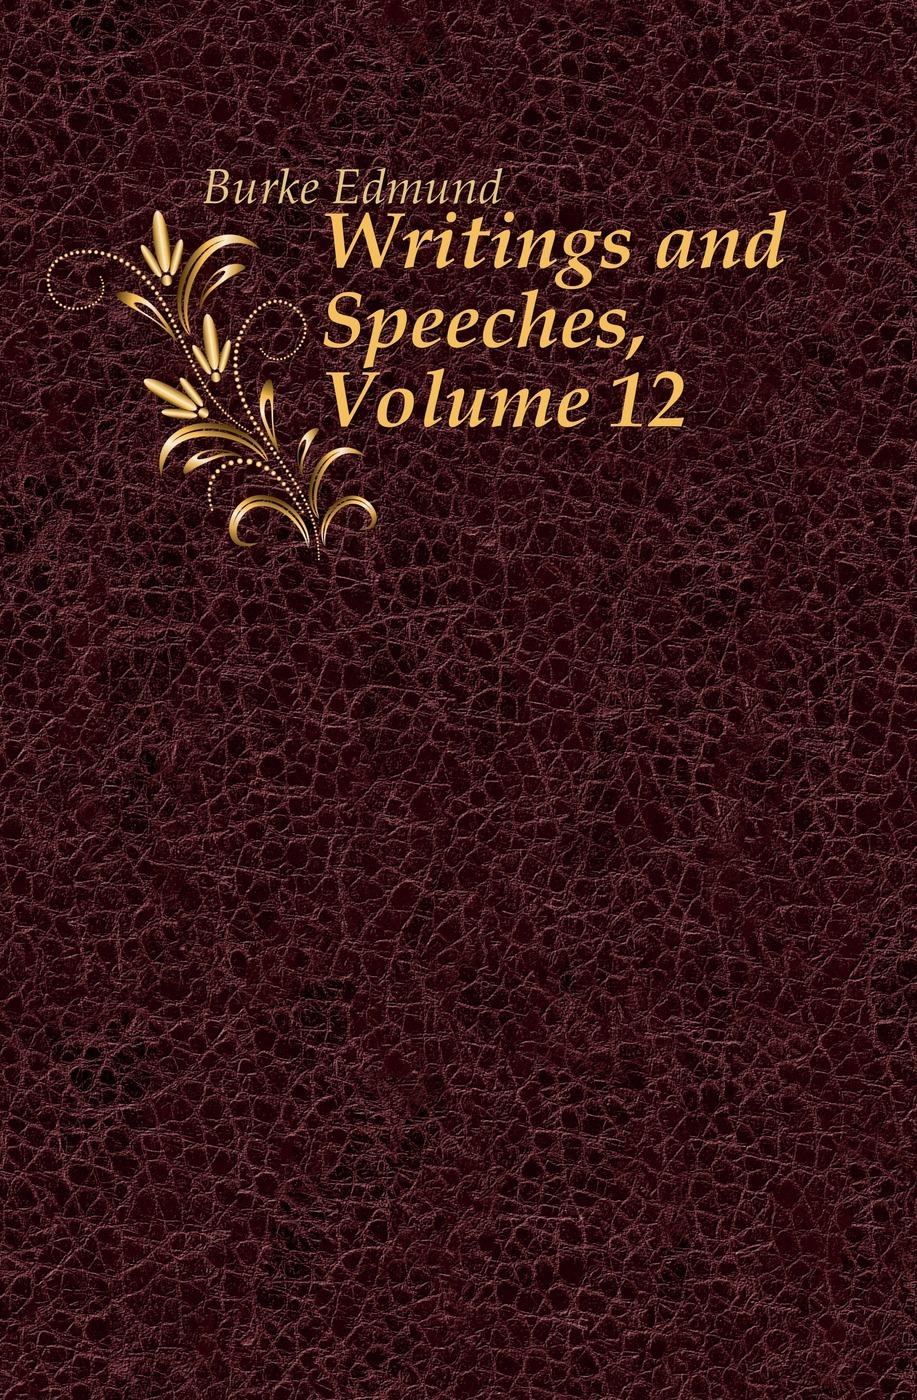 Writings and Speeches, Volume 12